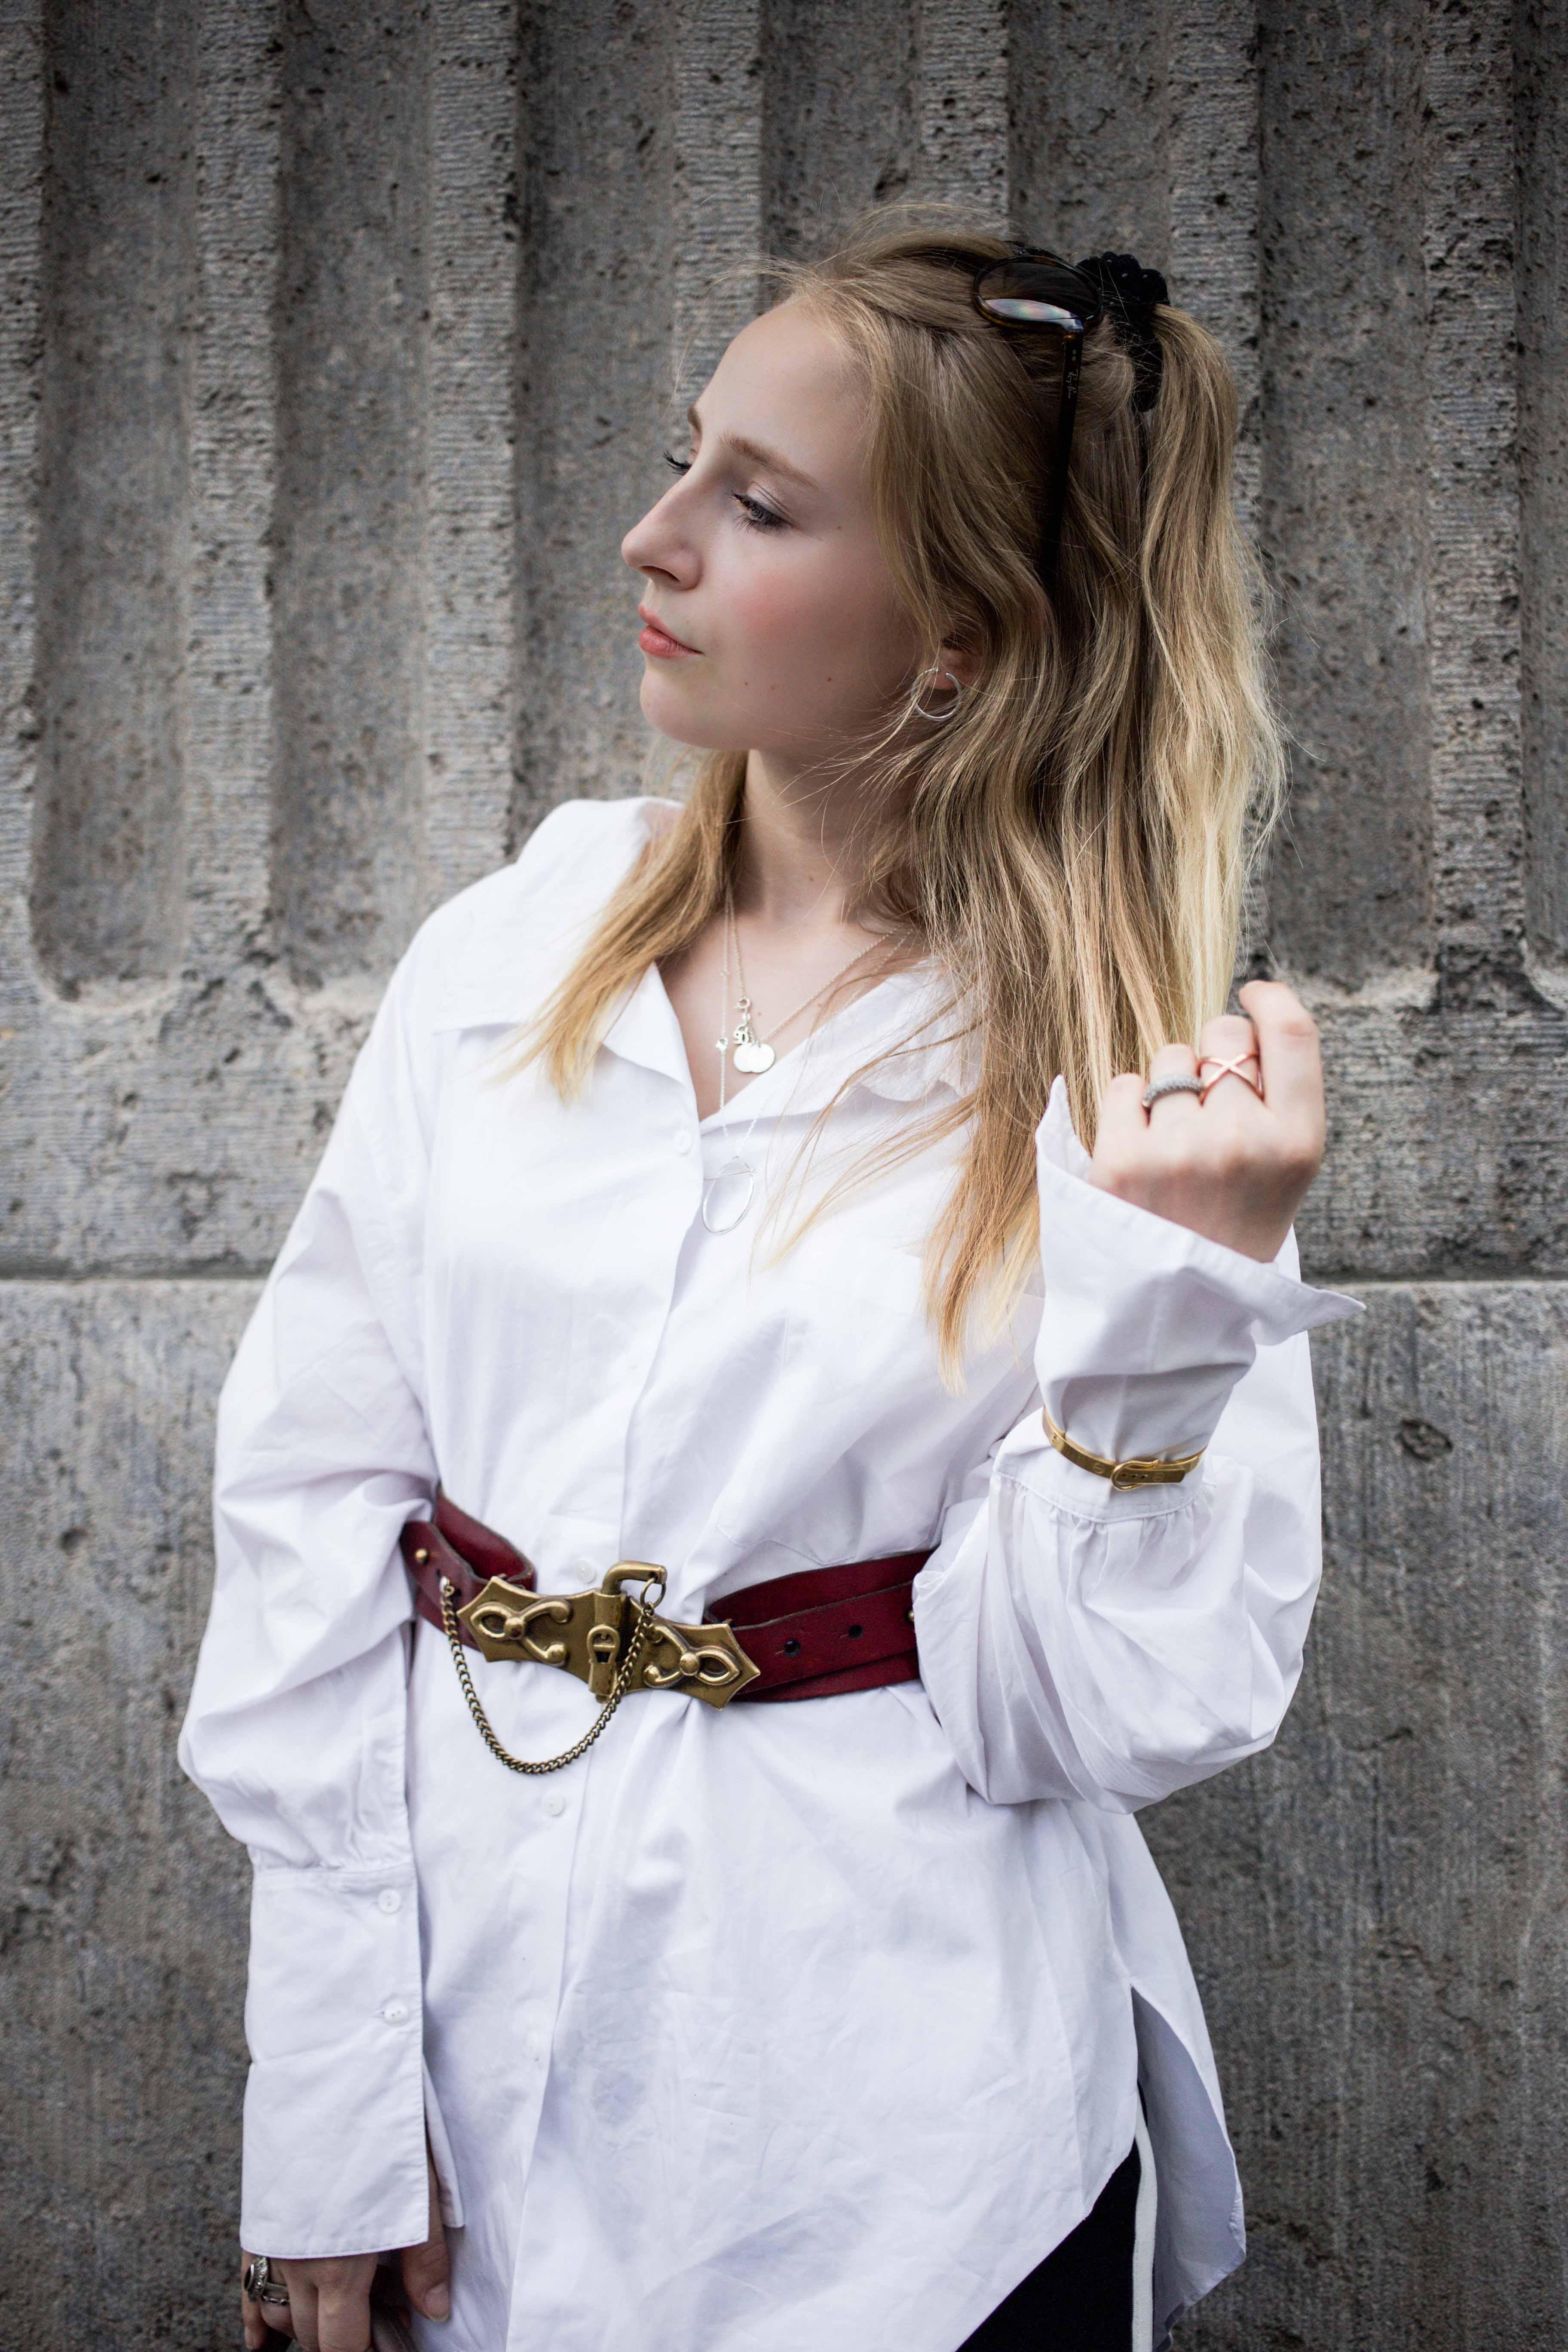 fashionweek-berlin-statement-gürtel-oversized-bluse-outfit-modeblog_6341